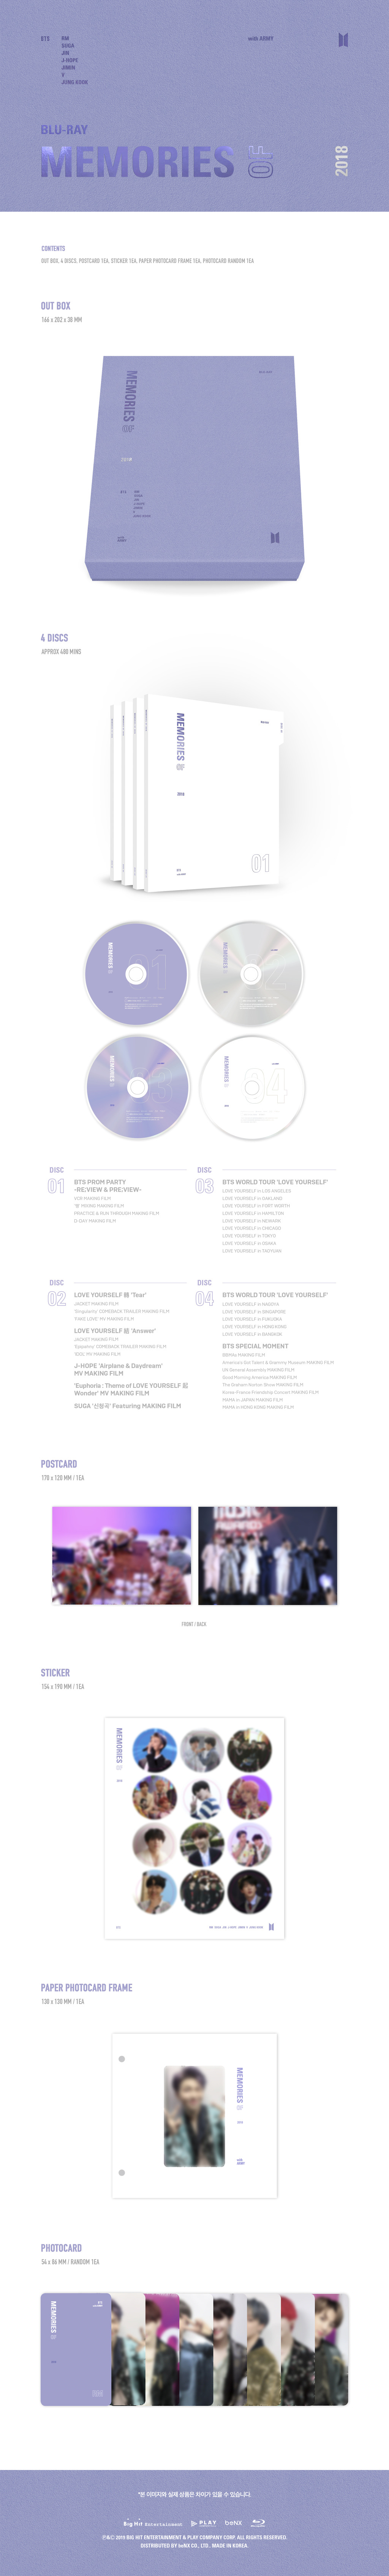 Info] BTS MEMORIES OF 2018 DVD+BLU-RAY